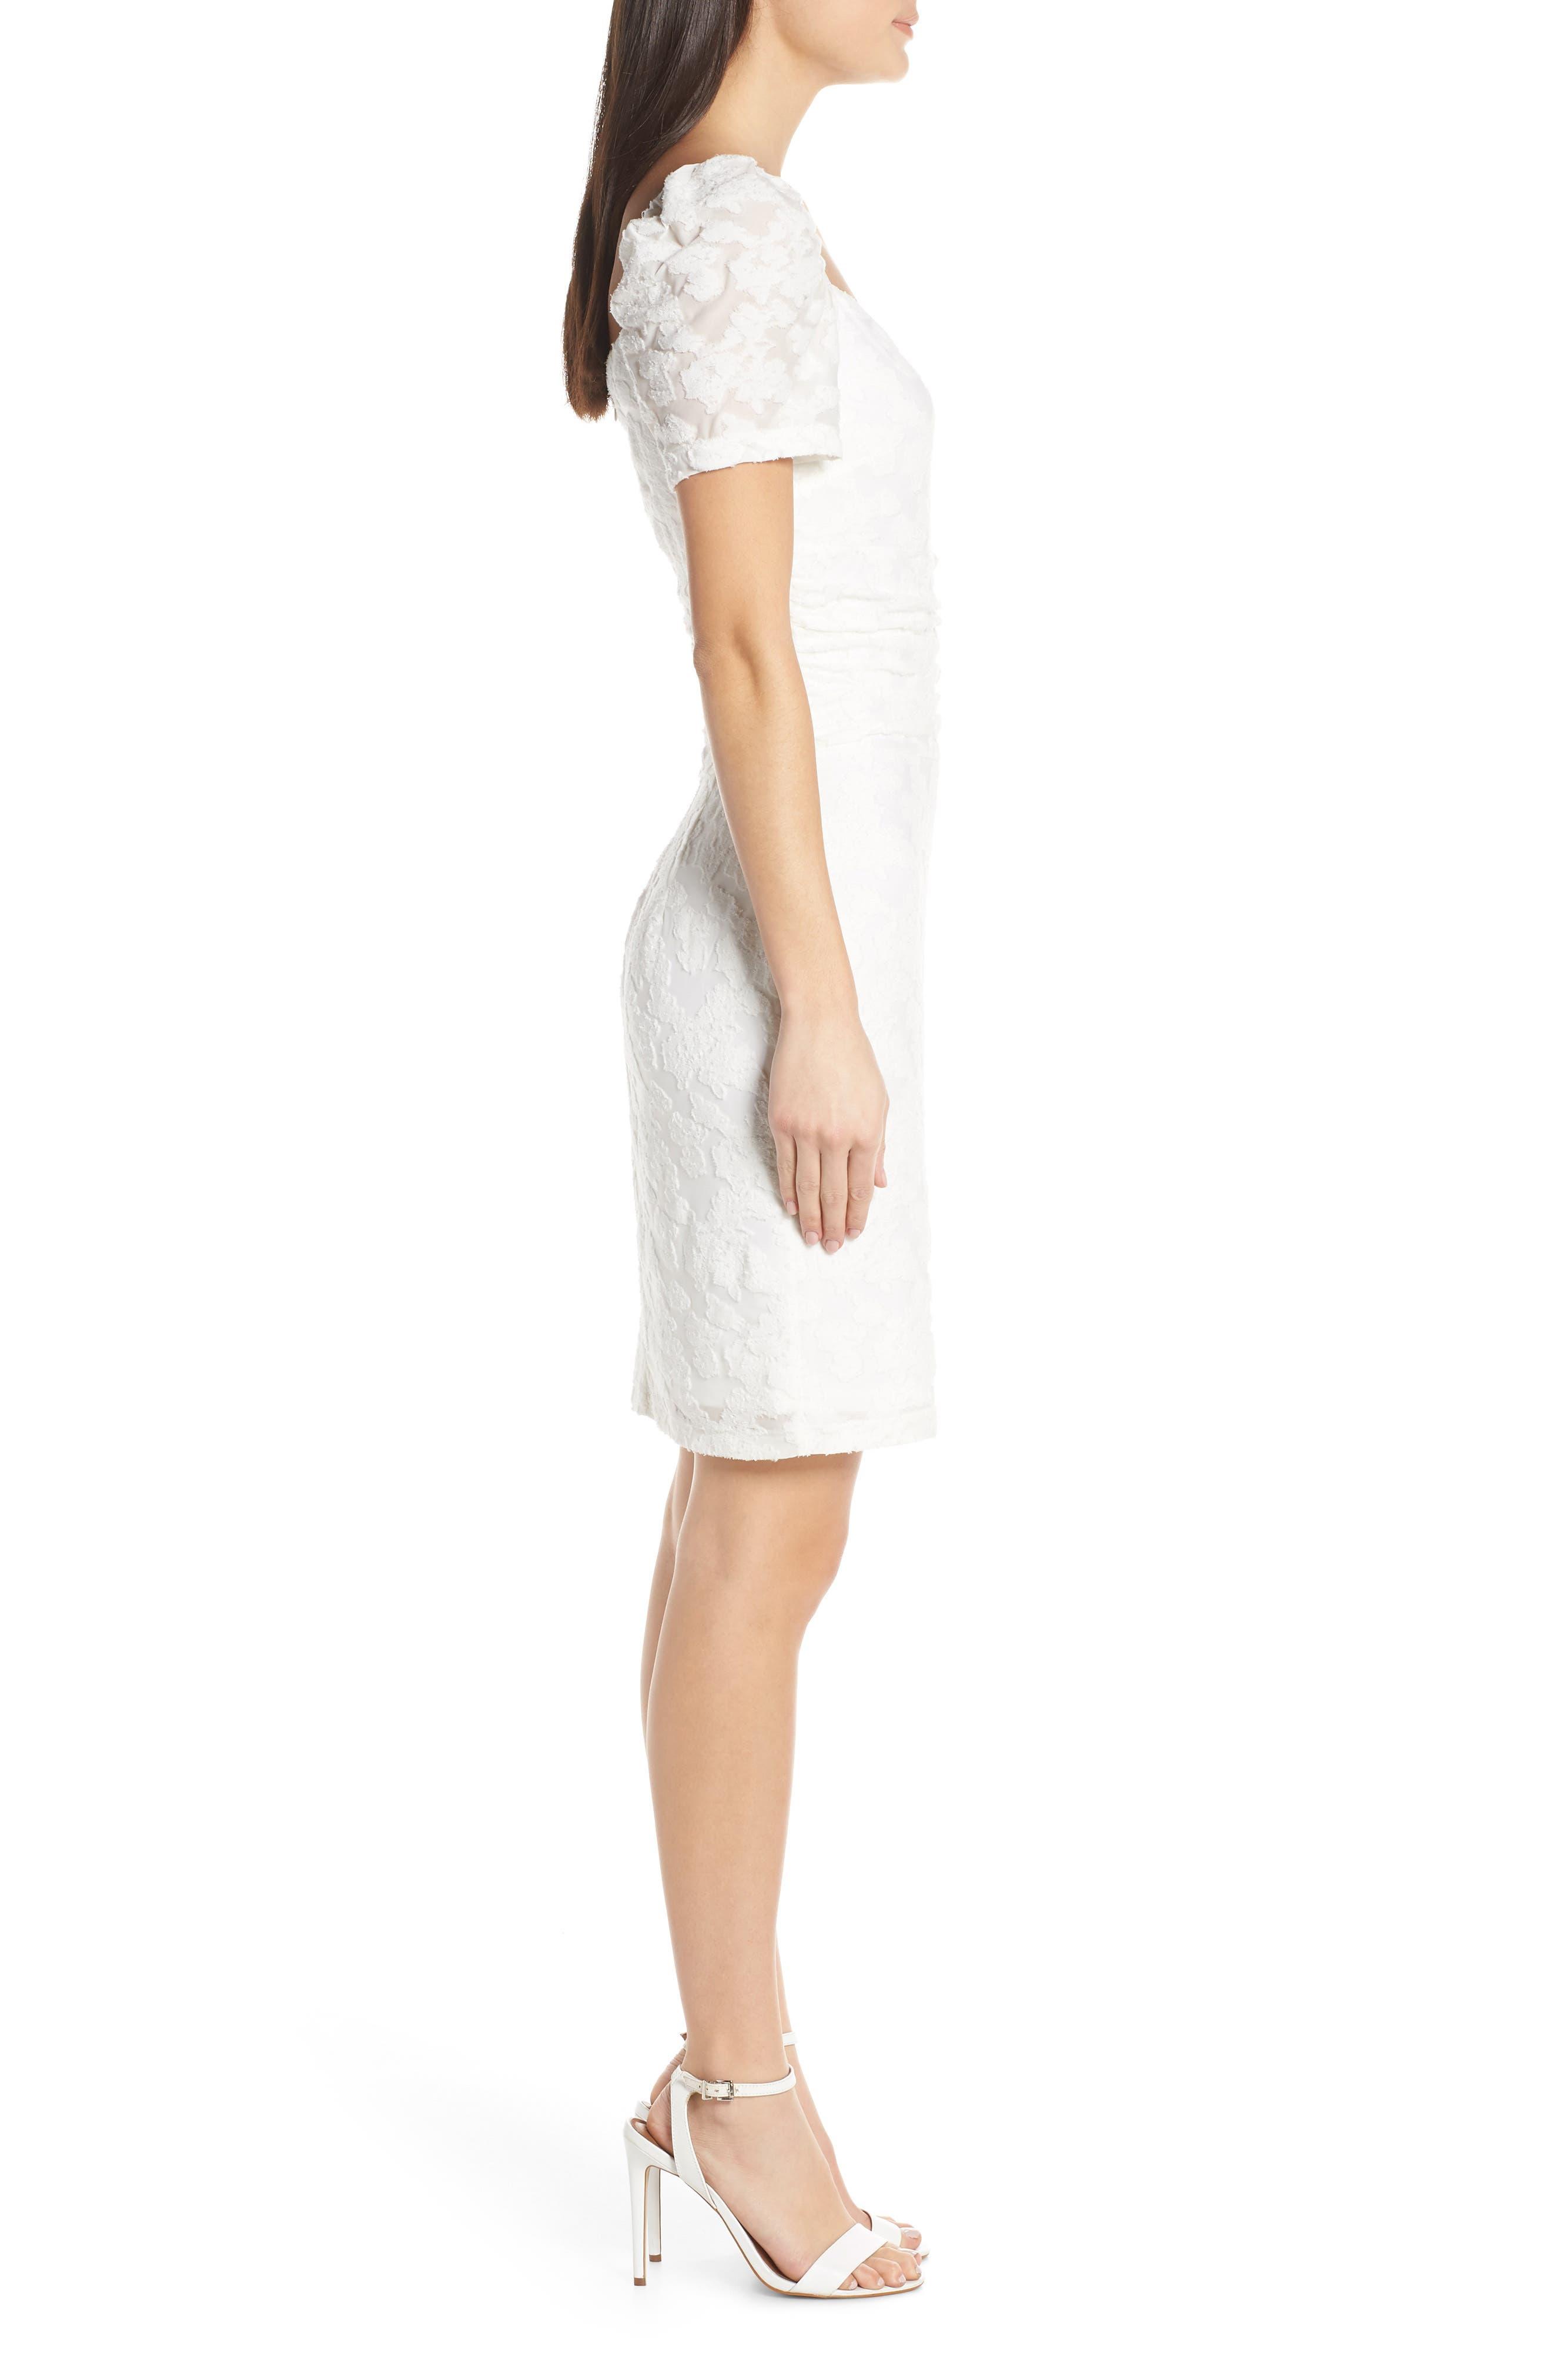 ALI & JAY, Big Mistake Short Sleeve Sheath Dress, Alternate thumbnail 4, color, WHITE FLORAL